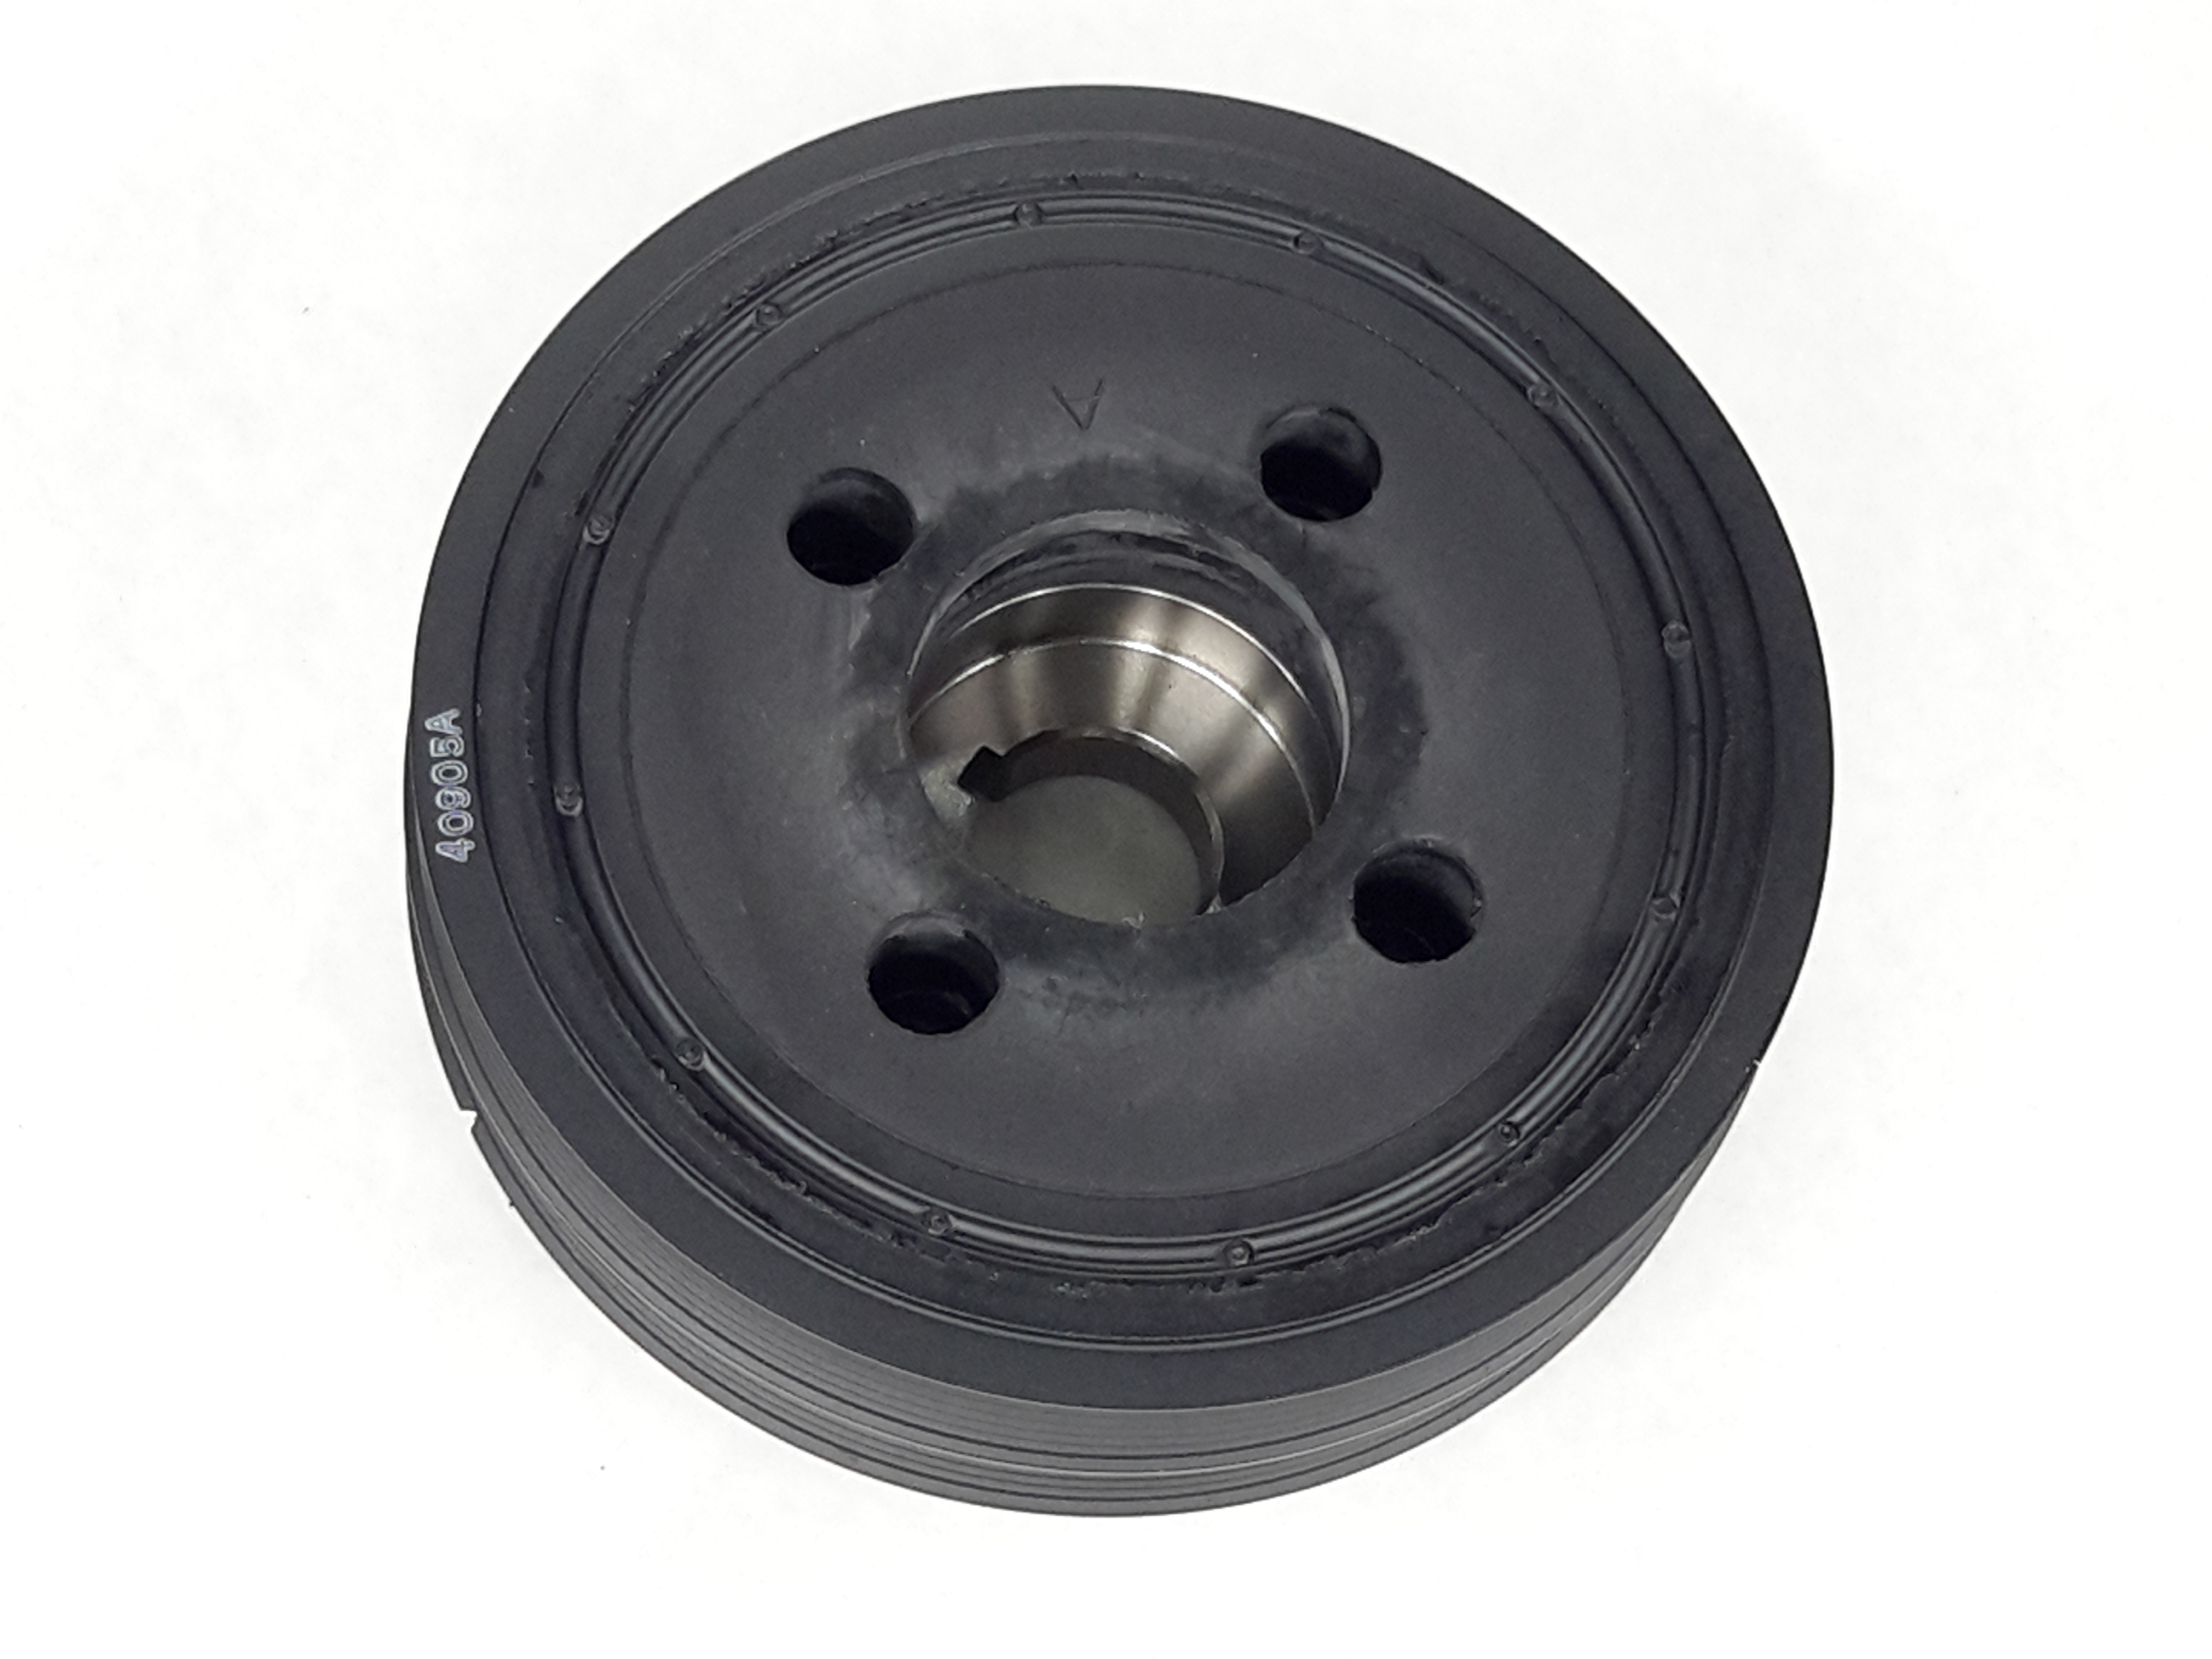 Subaru Timing Belt Pulley Torque : Subaru baja pulley crankshaft timing belt camshaft